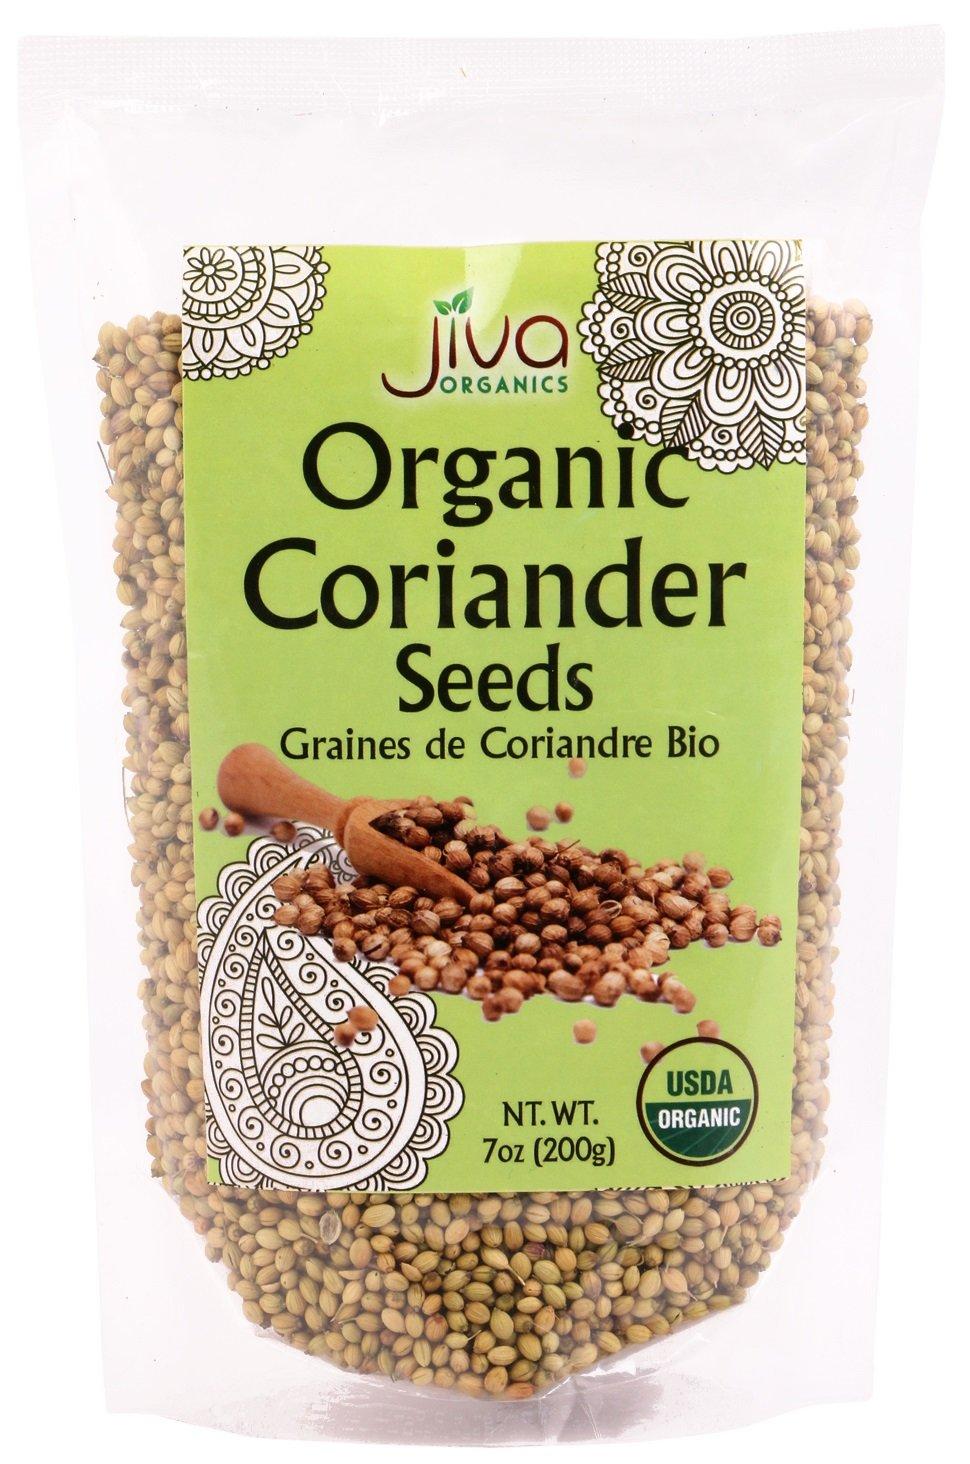 Jiva USDA Organic Coriander Seeds Whole 7 Ounce - New!